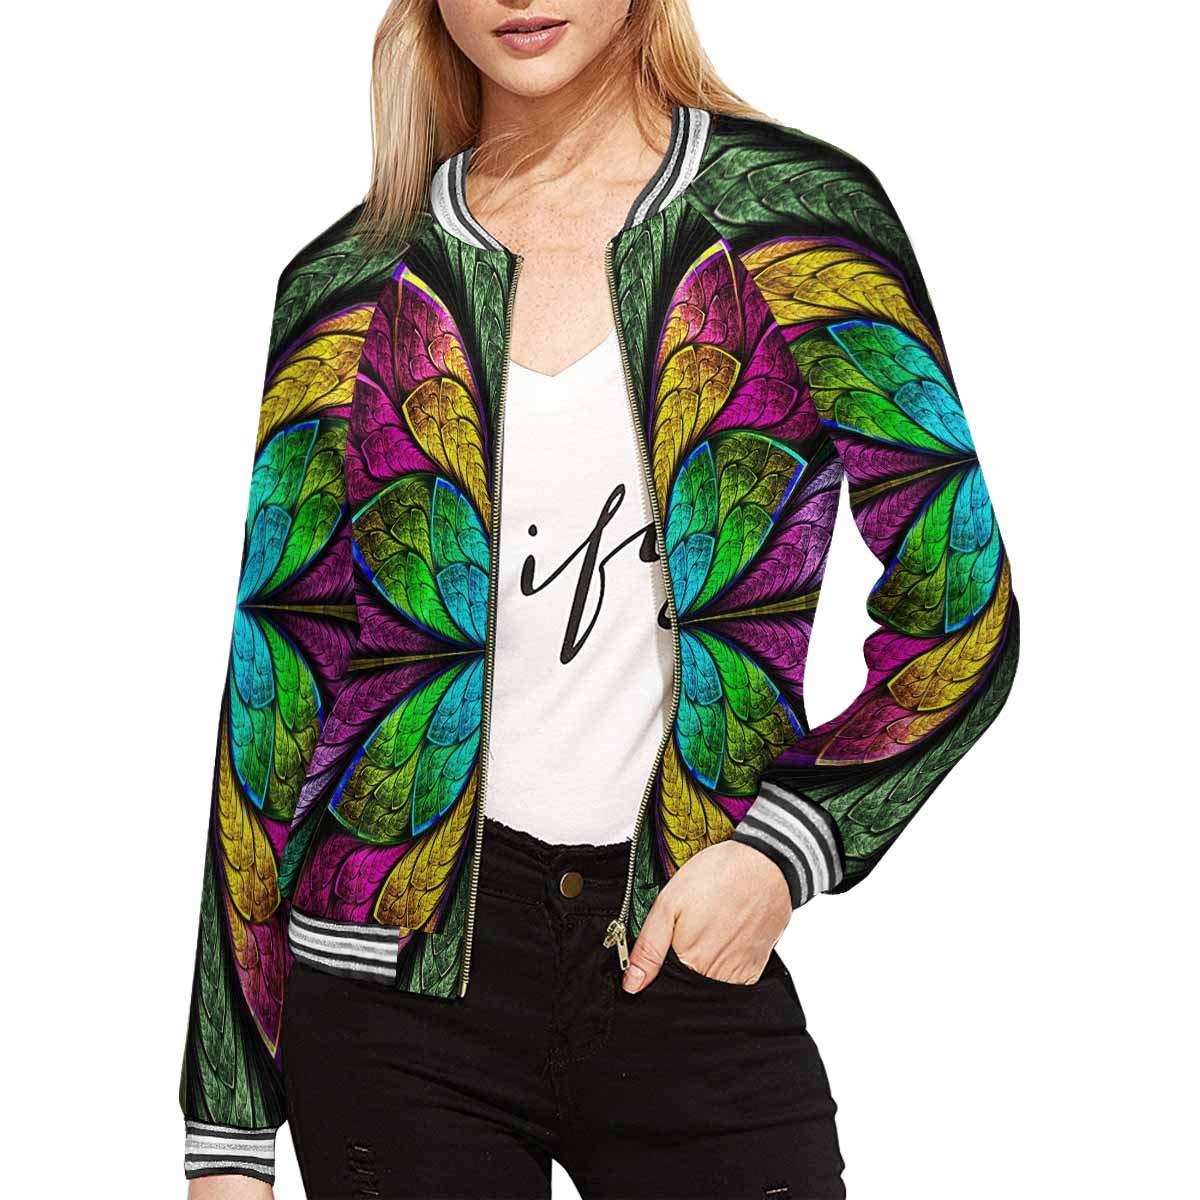 InterestPrint Symmetrical Multicolor Fractal Flower in Stained Glass Style Women's Casual Jacket Coat XXL